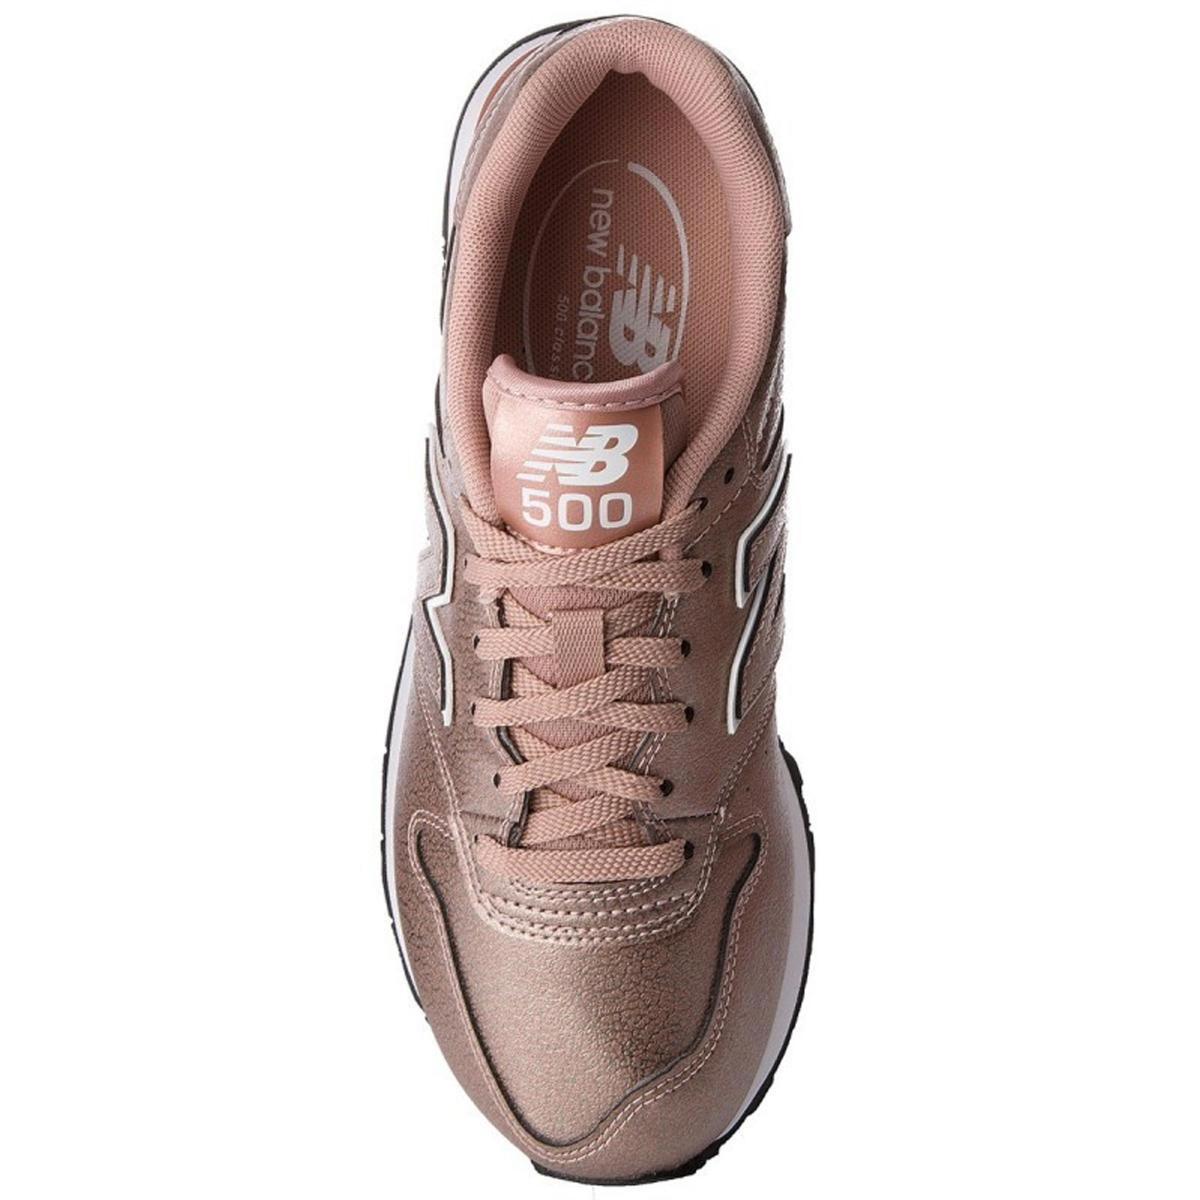 Scarpe Sneakers New Balance da donna rif. GW500MTB